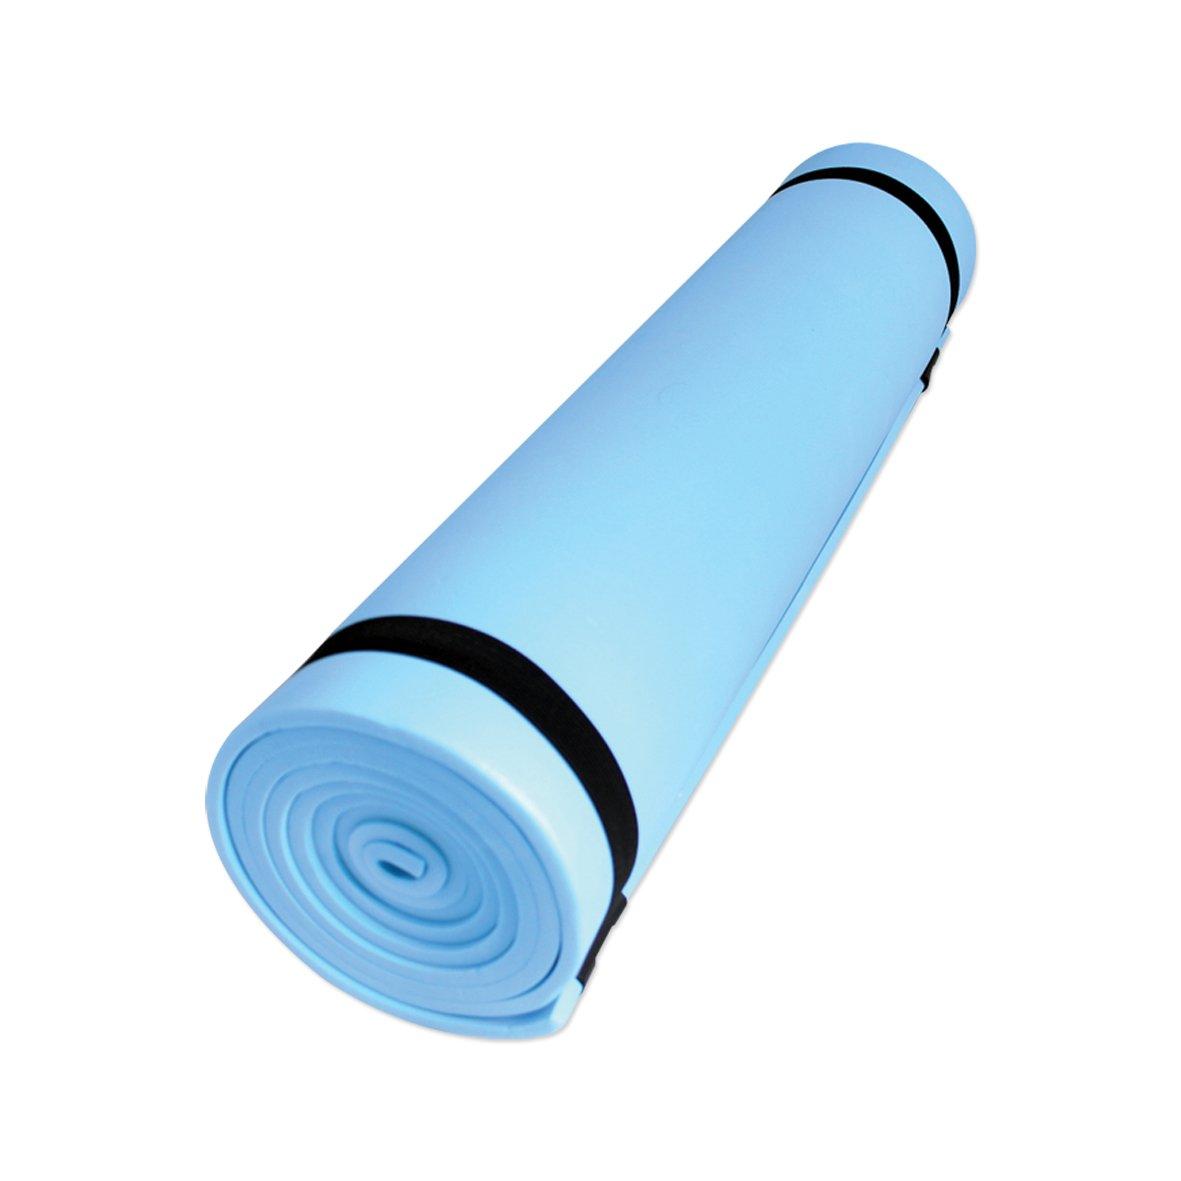 Amazon.com : Insulated Camping Mat Foam Blue 180 x 50 x 0.6 ...